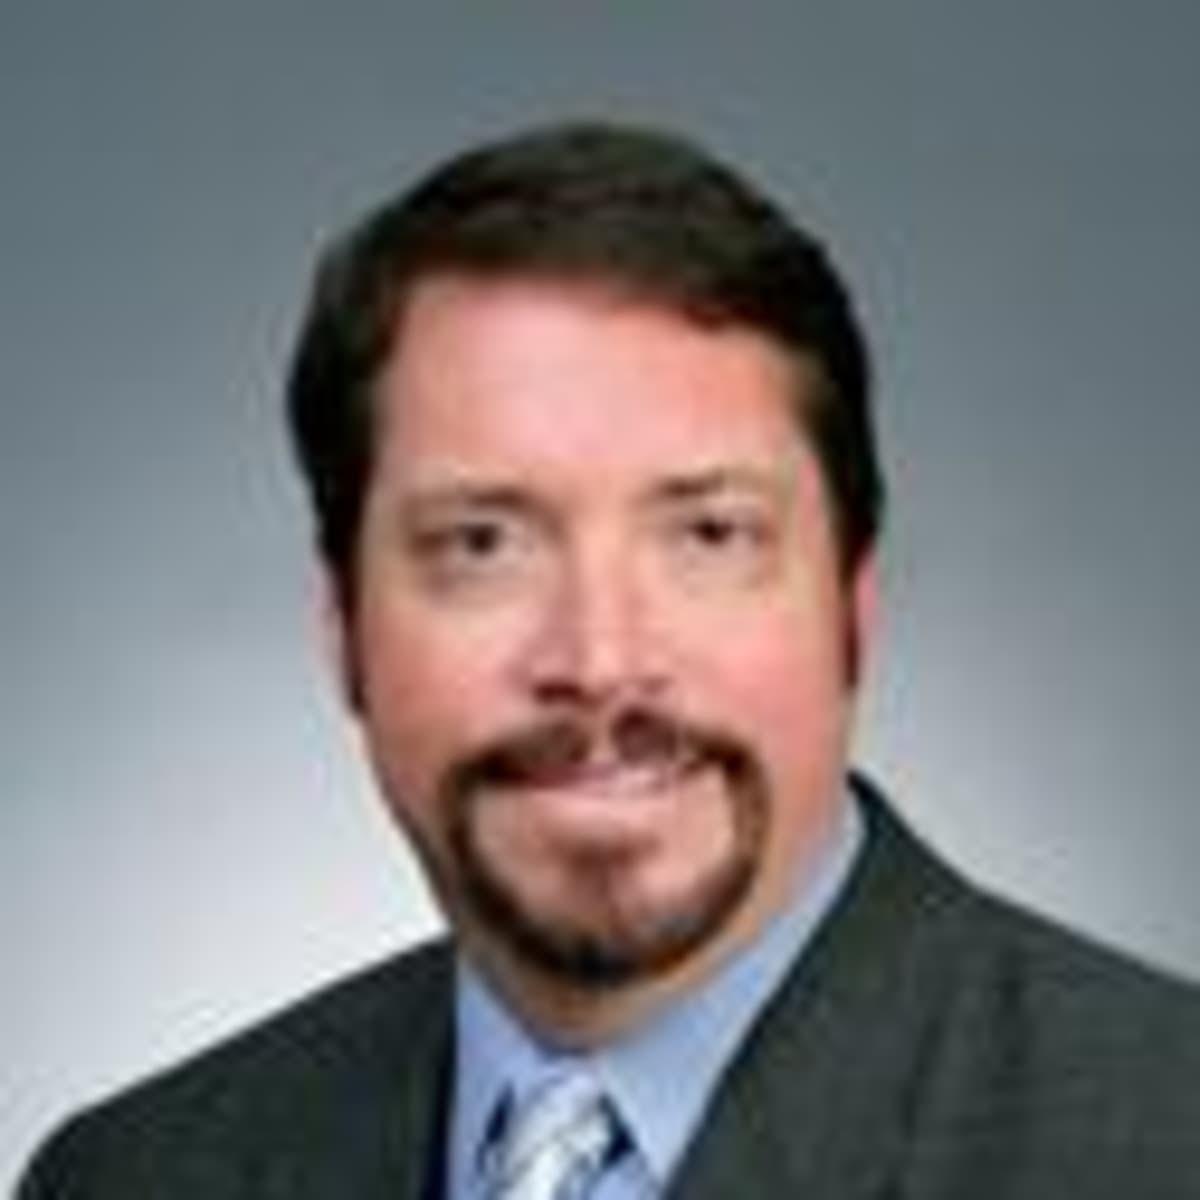 Dr. Pierre Podrebarac, MD   Kansas City, MO   Otolaryngologist